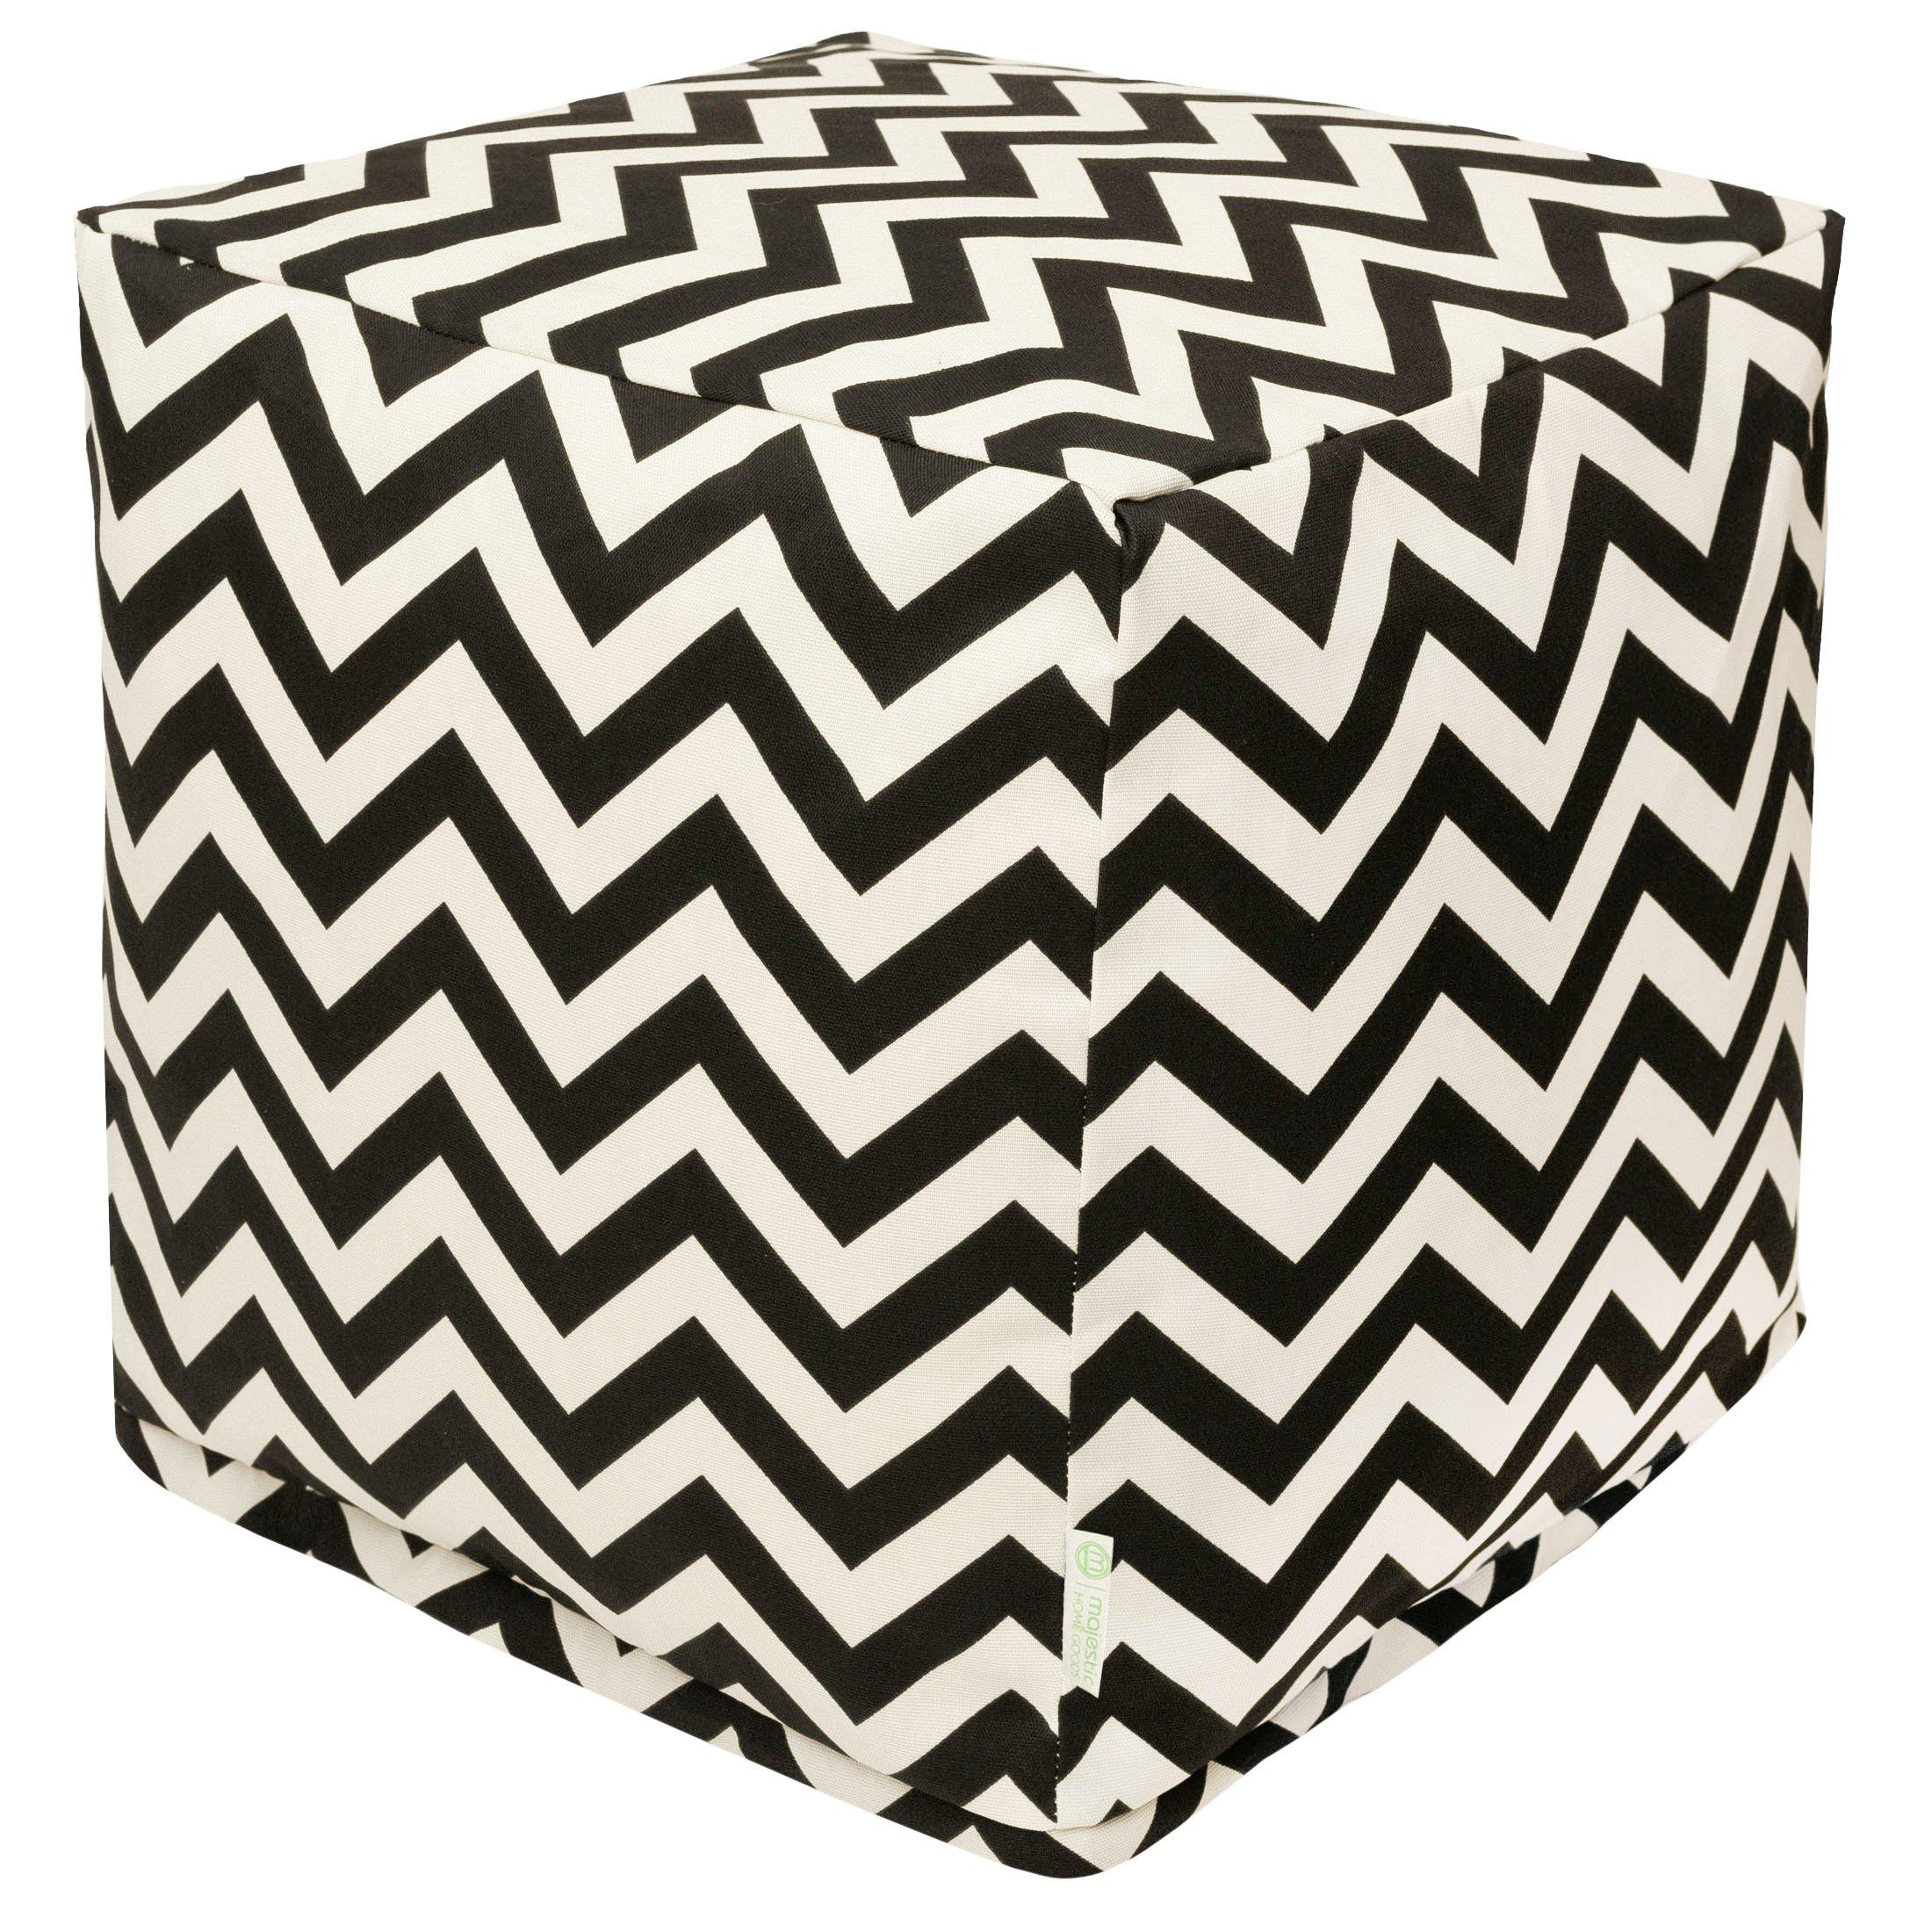 Majestic Home Goods Black Chevron Indoor/Outdoor Bean Bag Ottoman Pouf Cube 17'' L x 17'' W x 17'' H